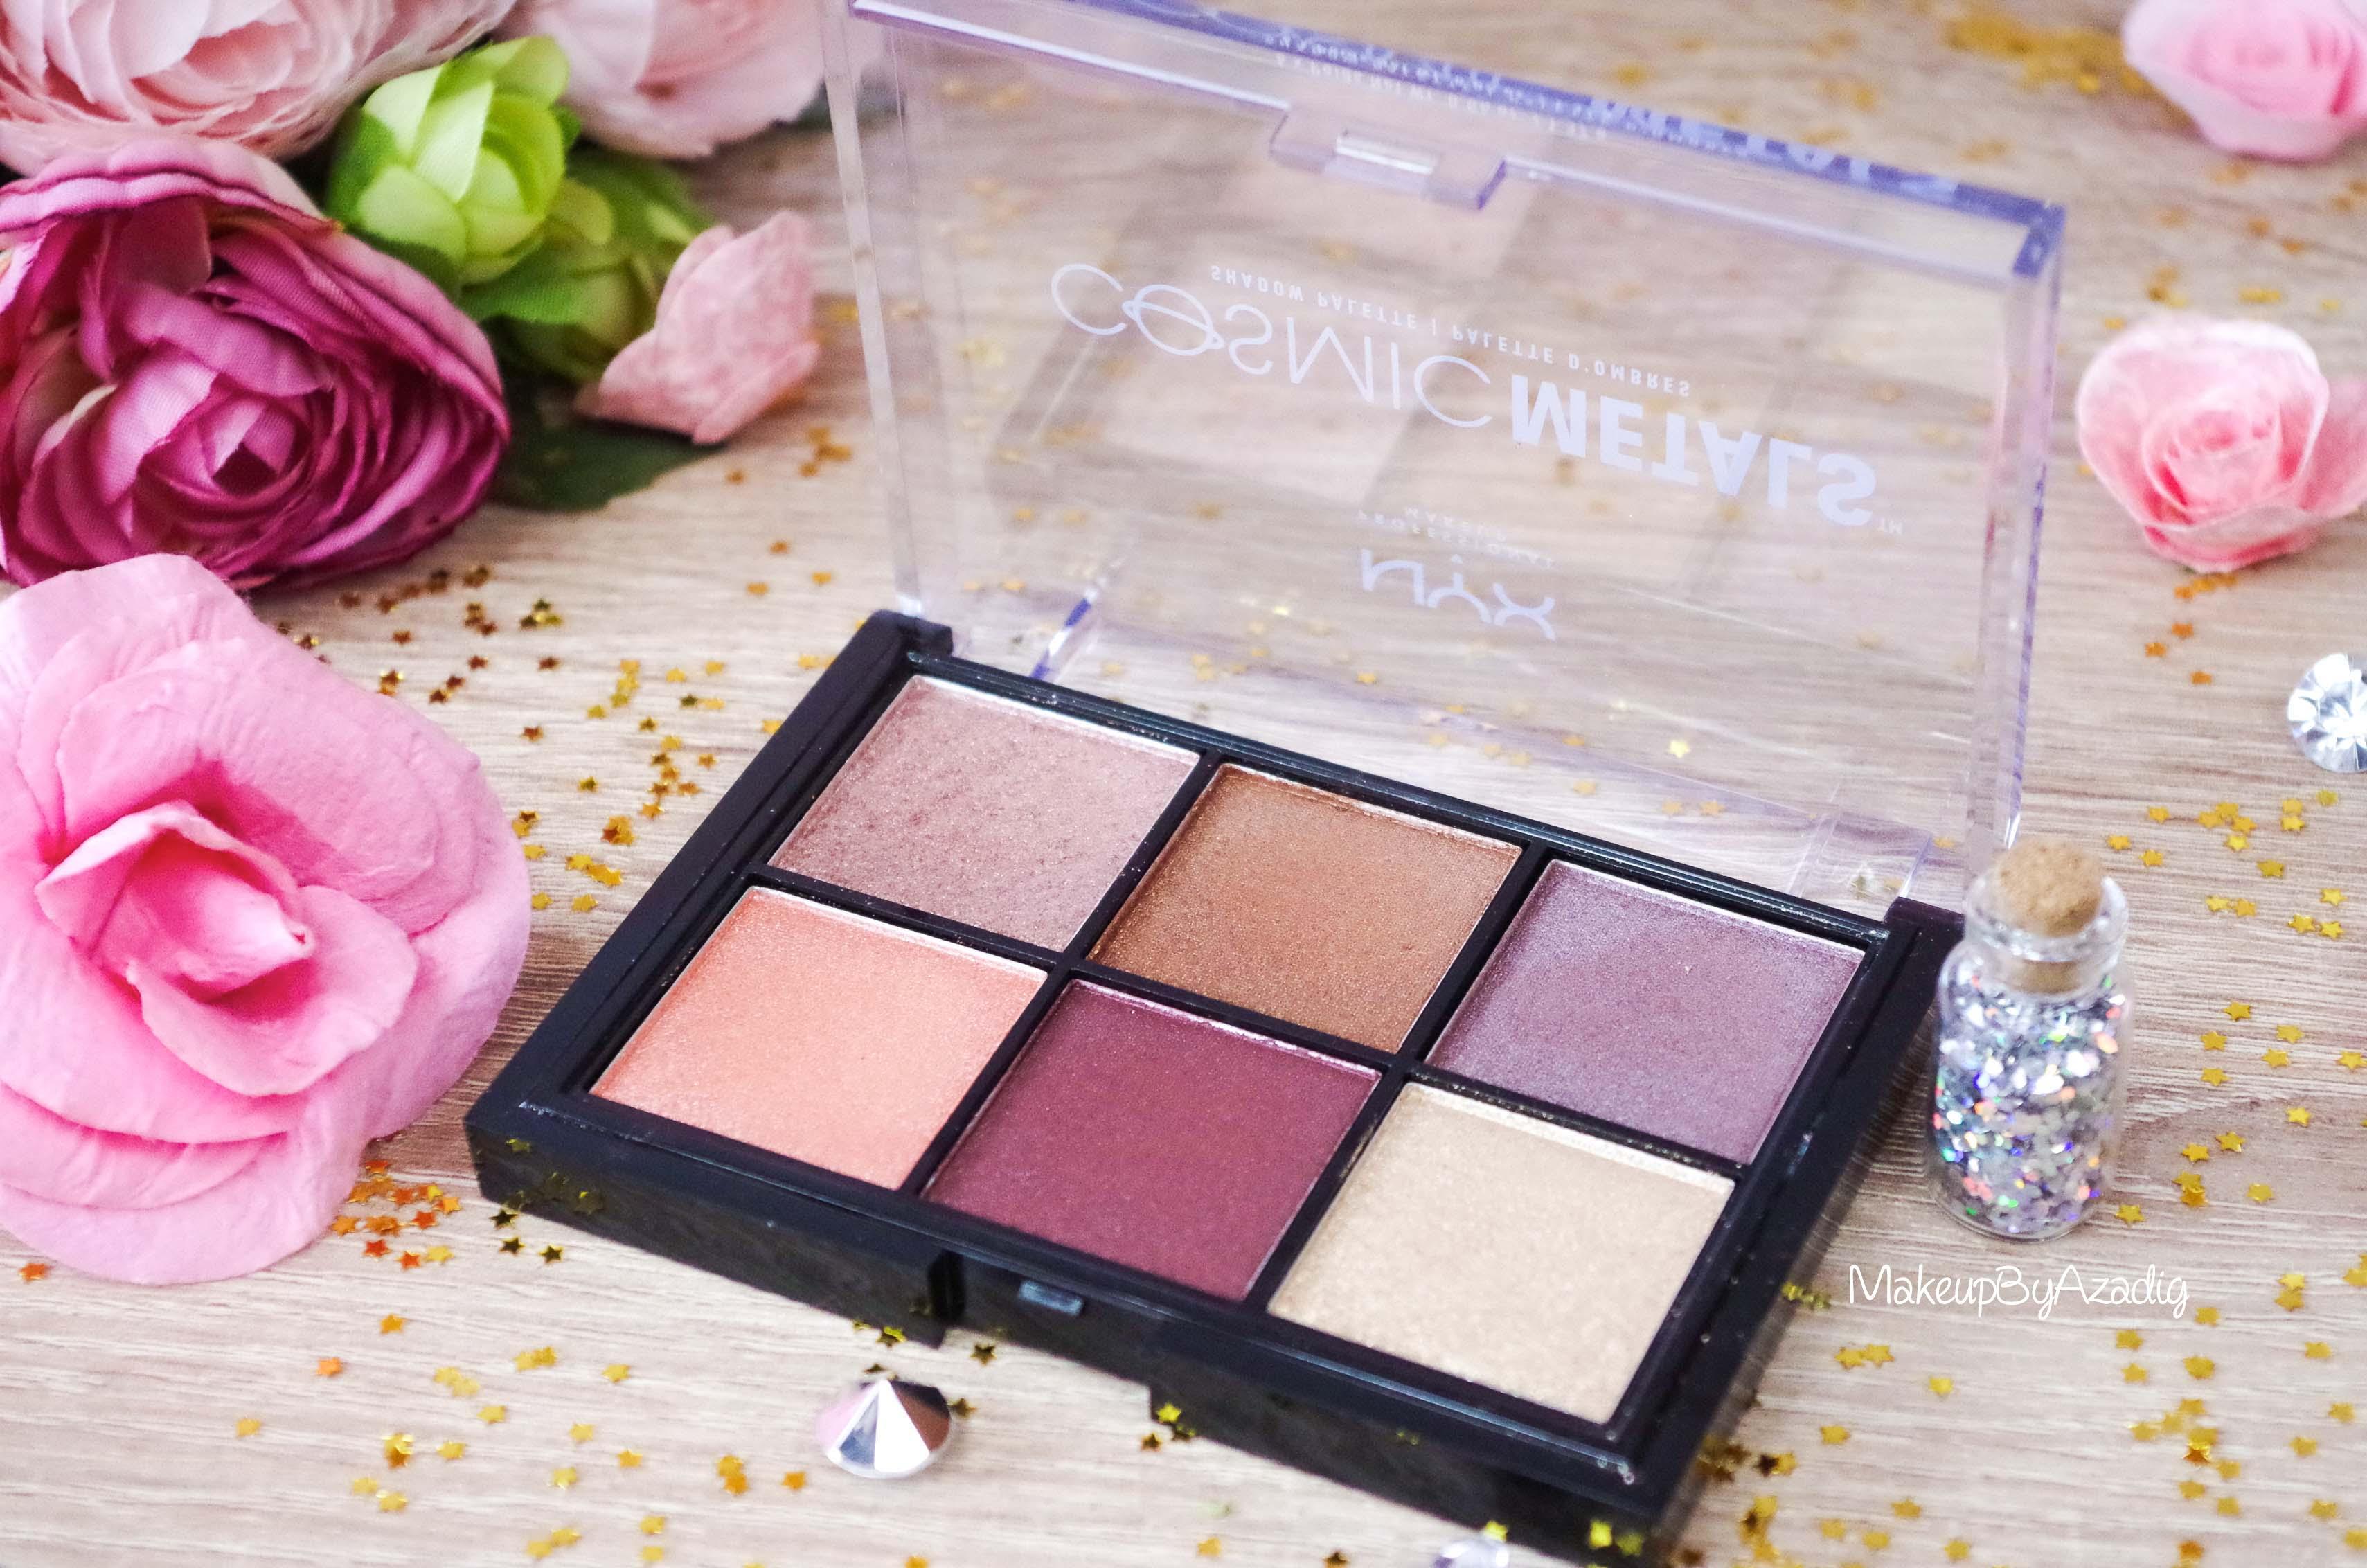 revue-palette-fards-paupieres-cosmic-metals-nyx-cosmetics-pas-cher-meilleure-makeupbyazadig-influencer-gold